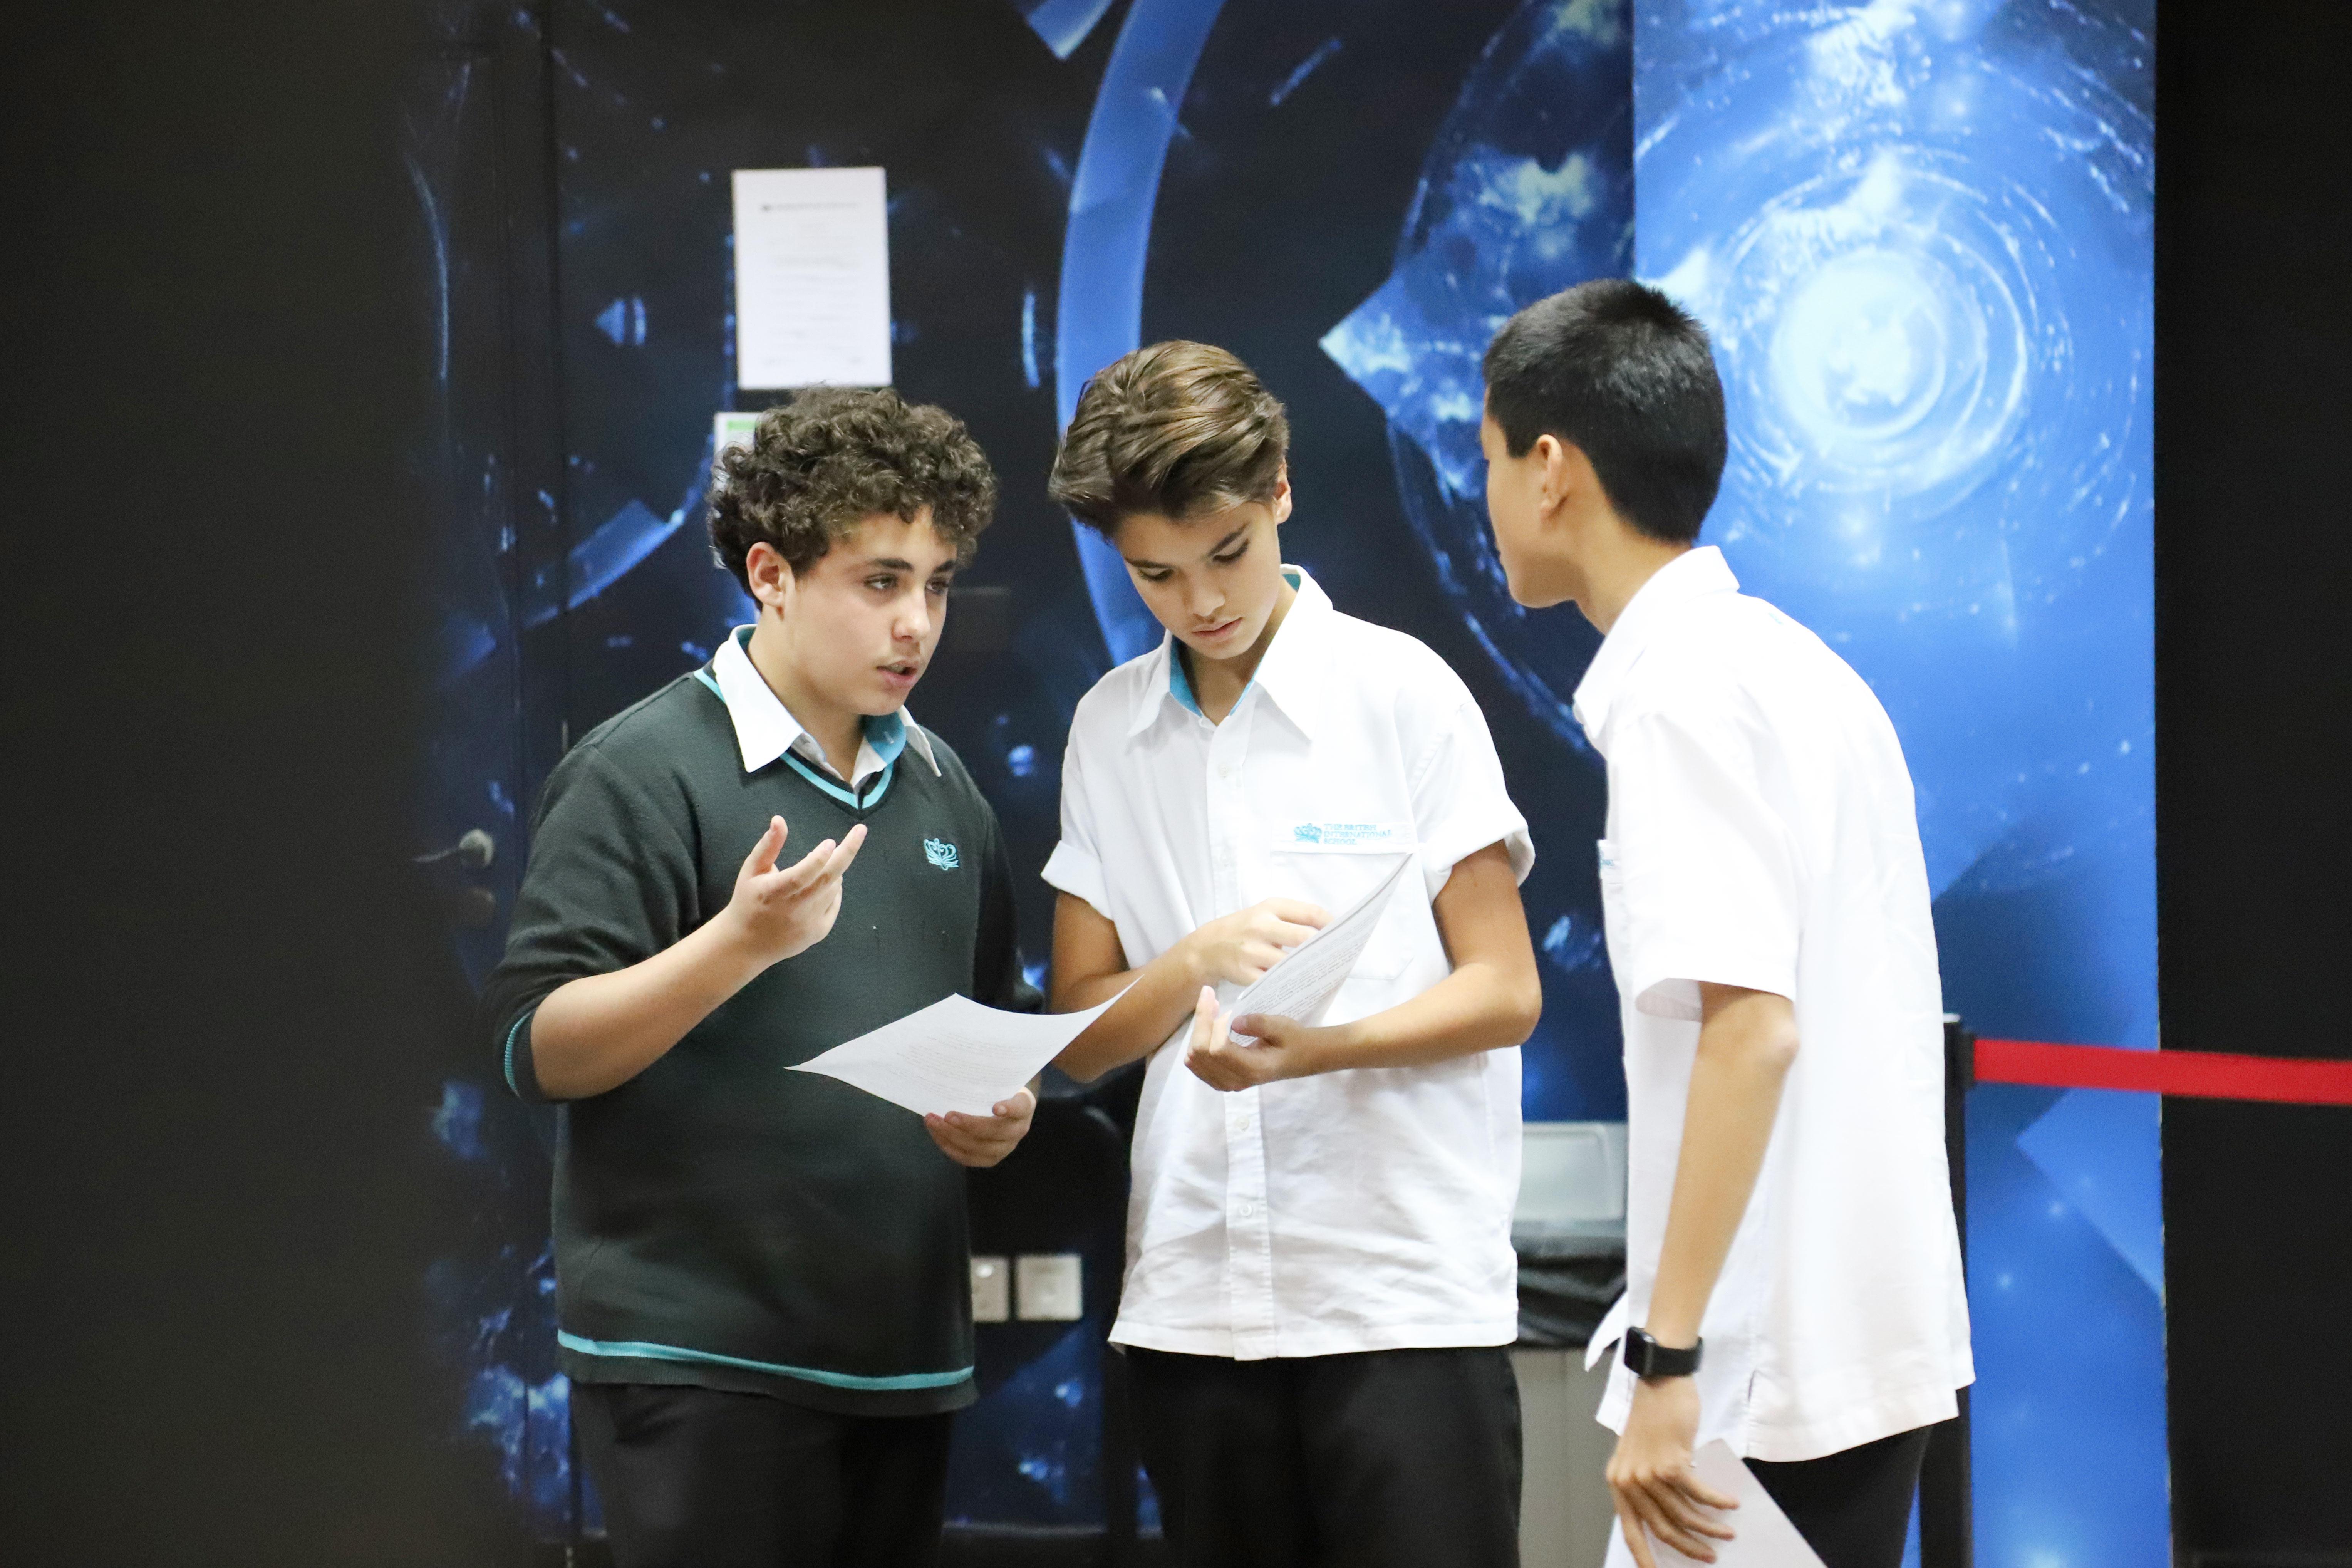 The British International School Abu Dhabi